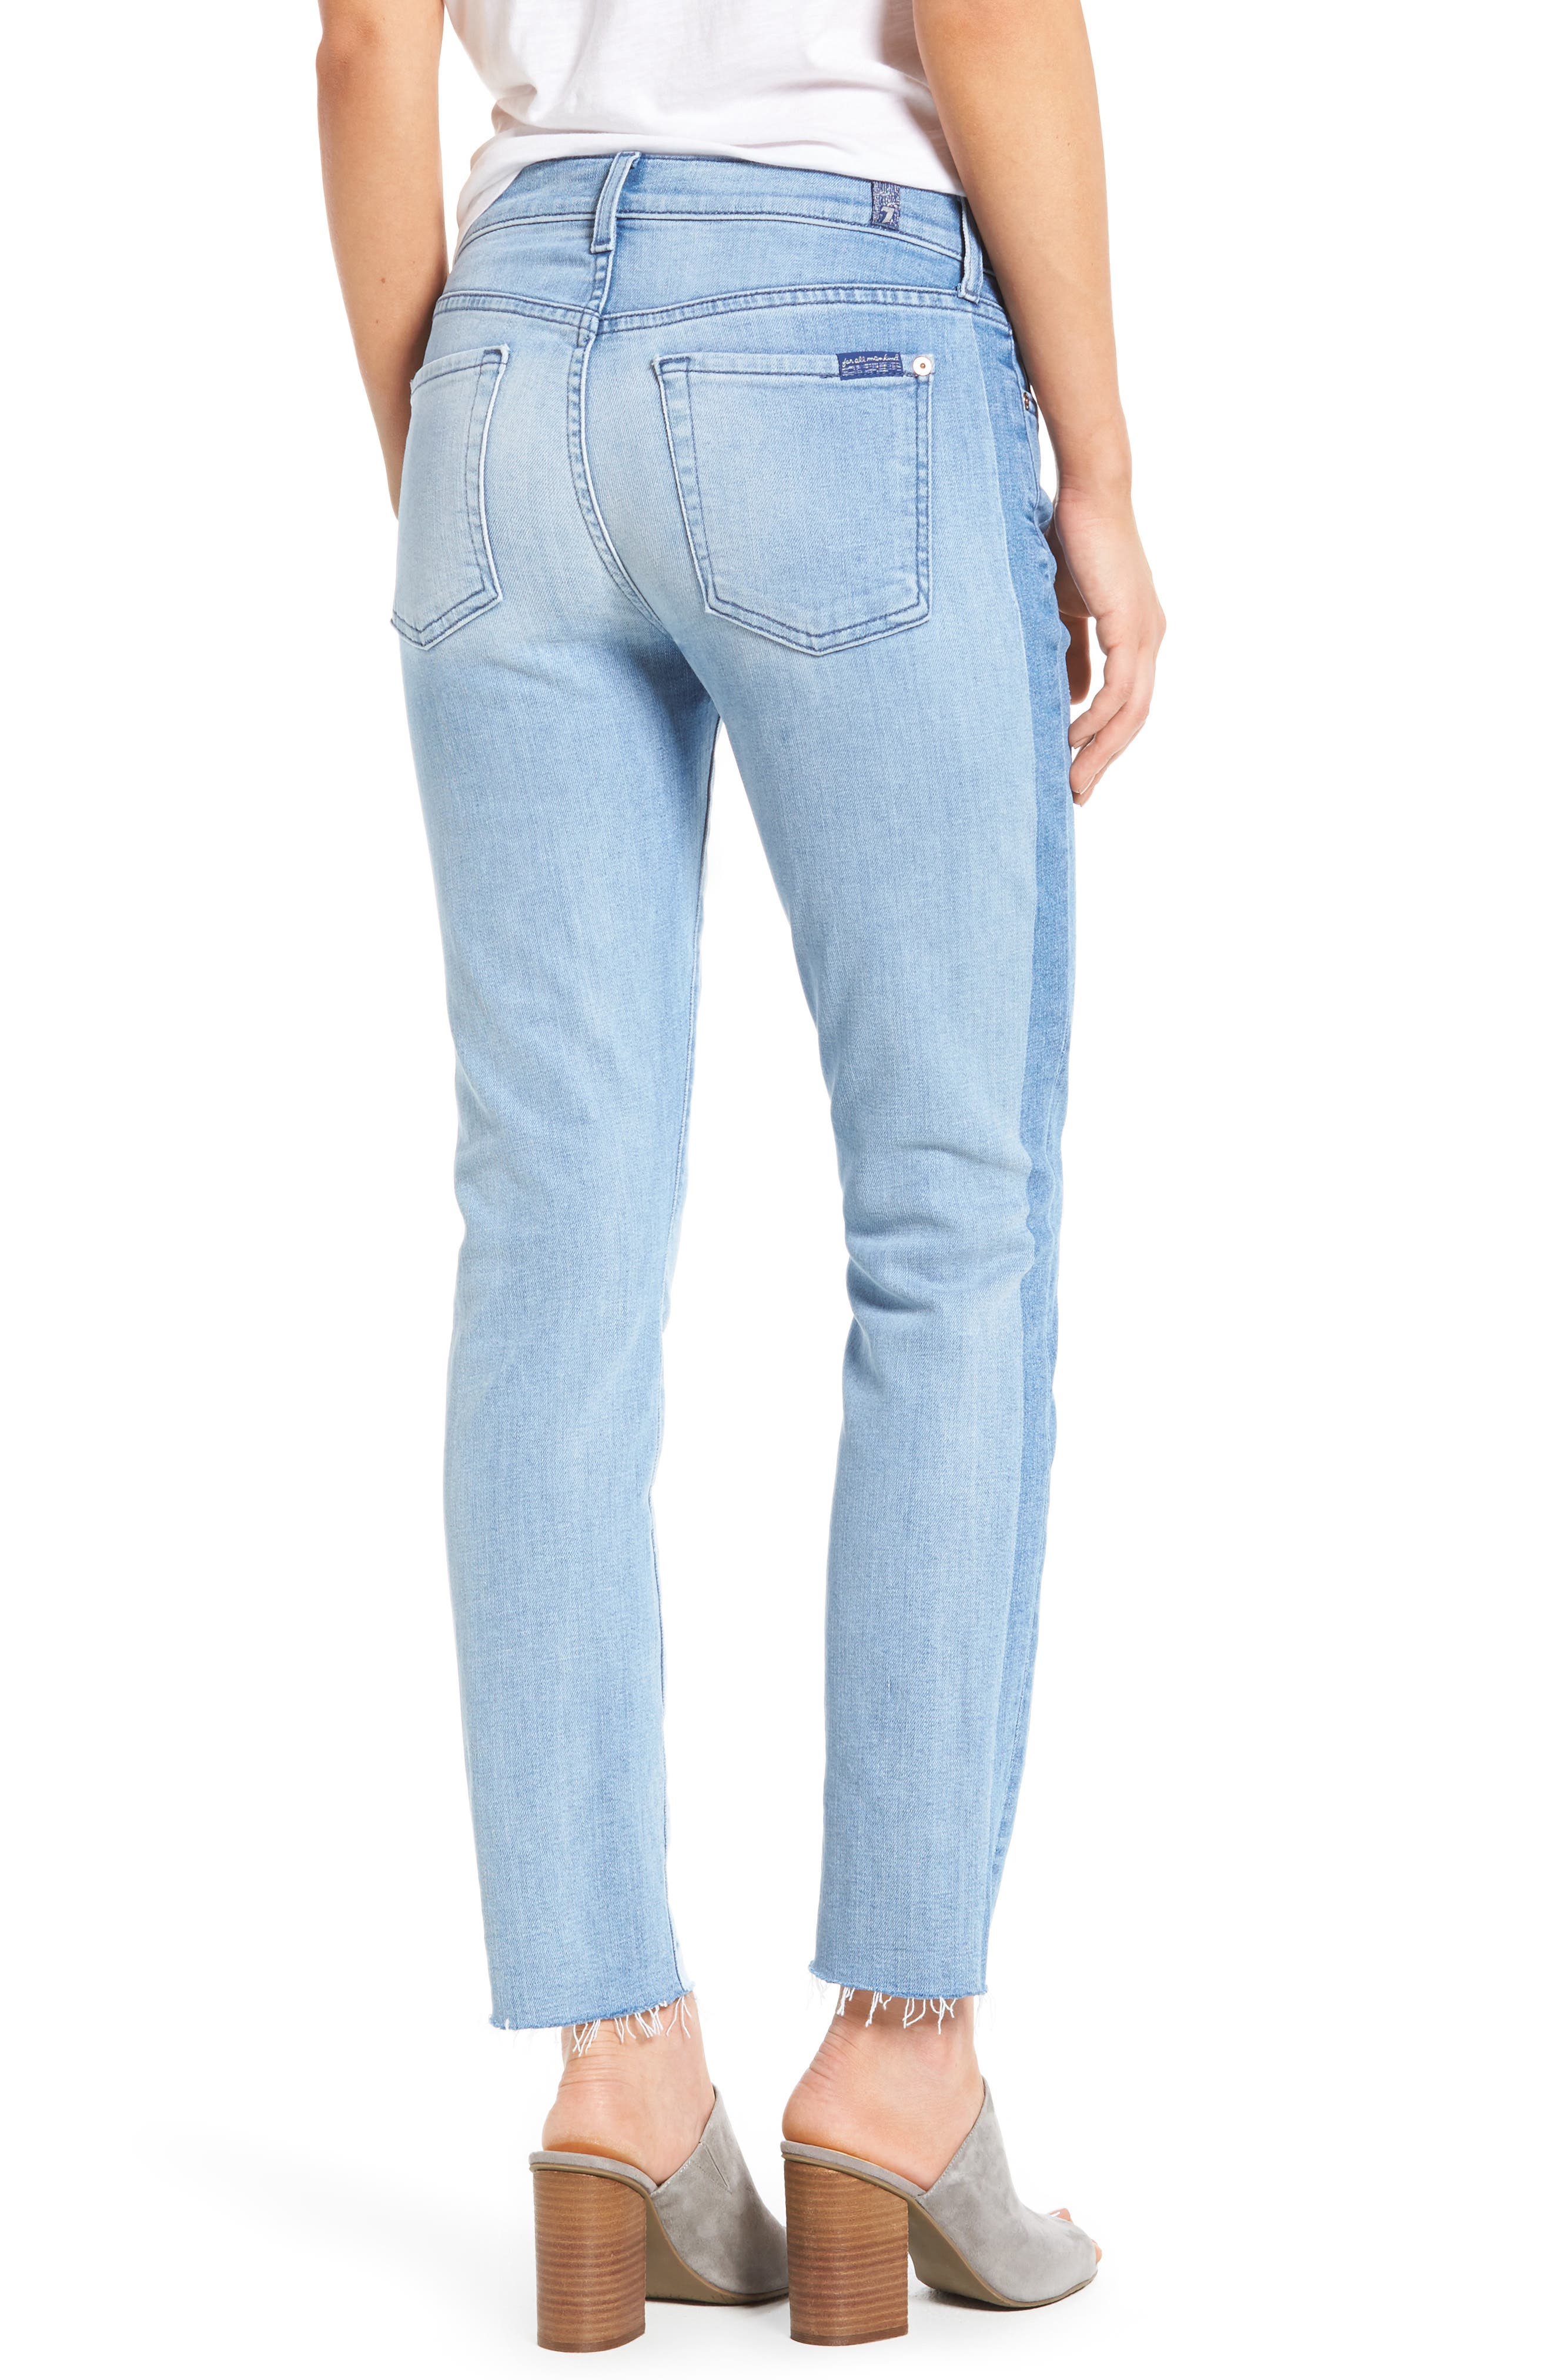 Alternate Image 3  - 7 For All Mankind® Roxanne Original Ankle Skinny Jeans (Bright Chelsea)